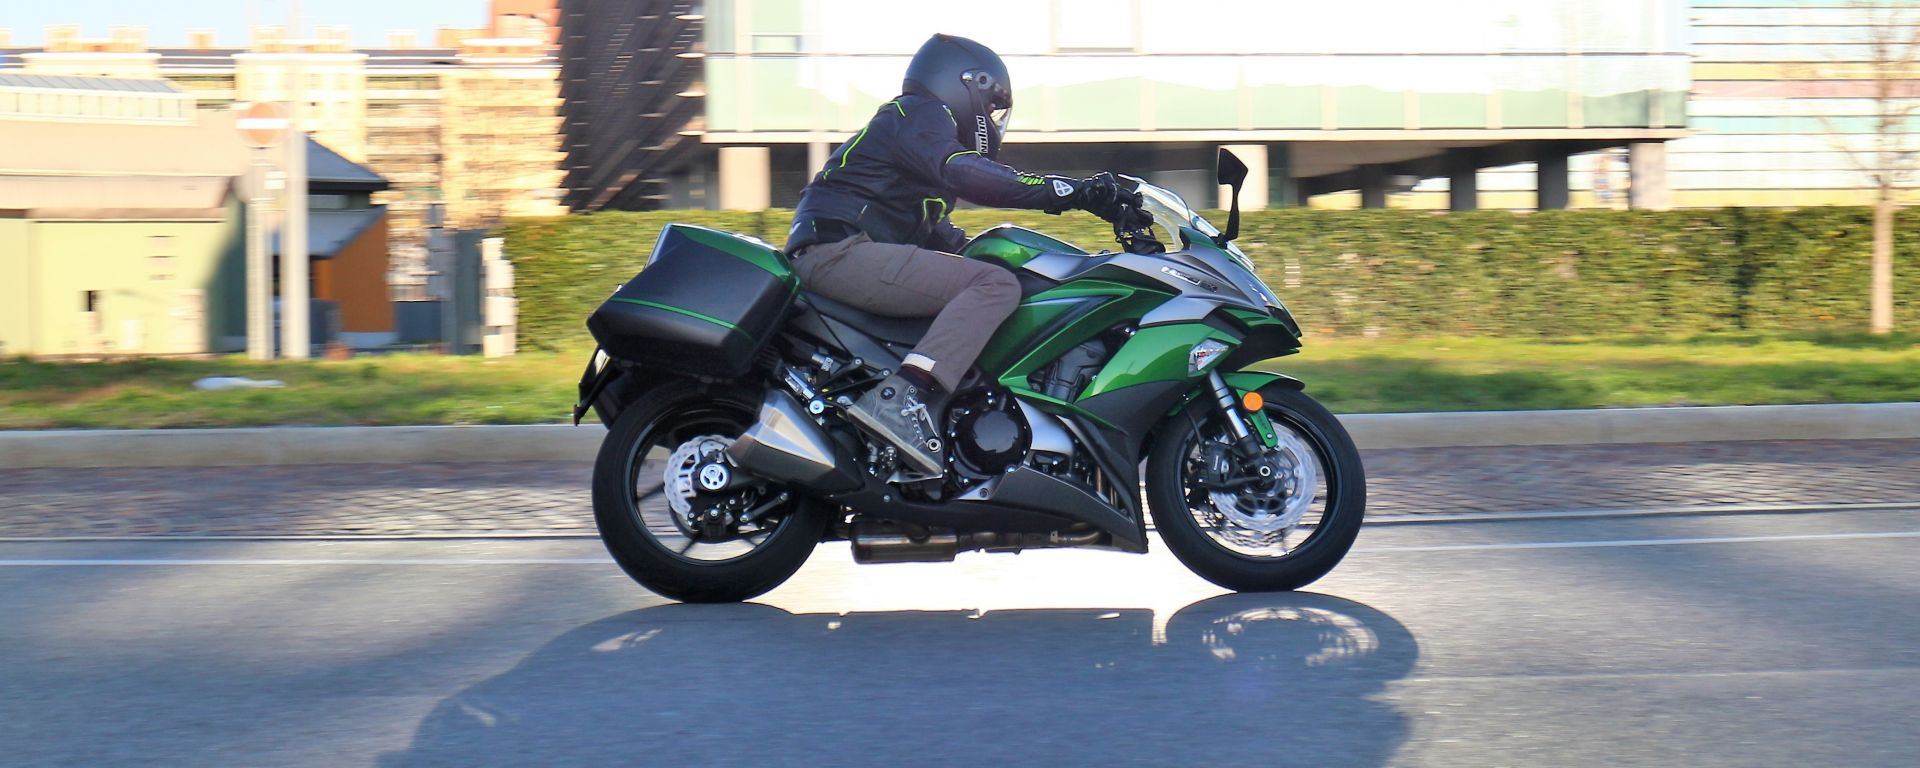 Kawasaki Z1000SX Tourer 2019